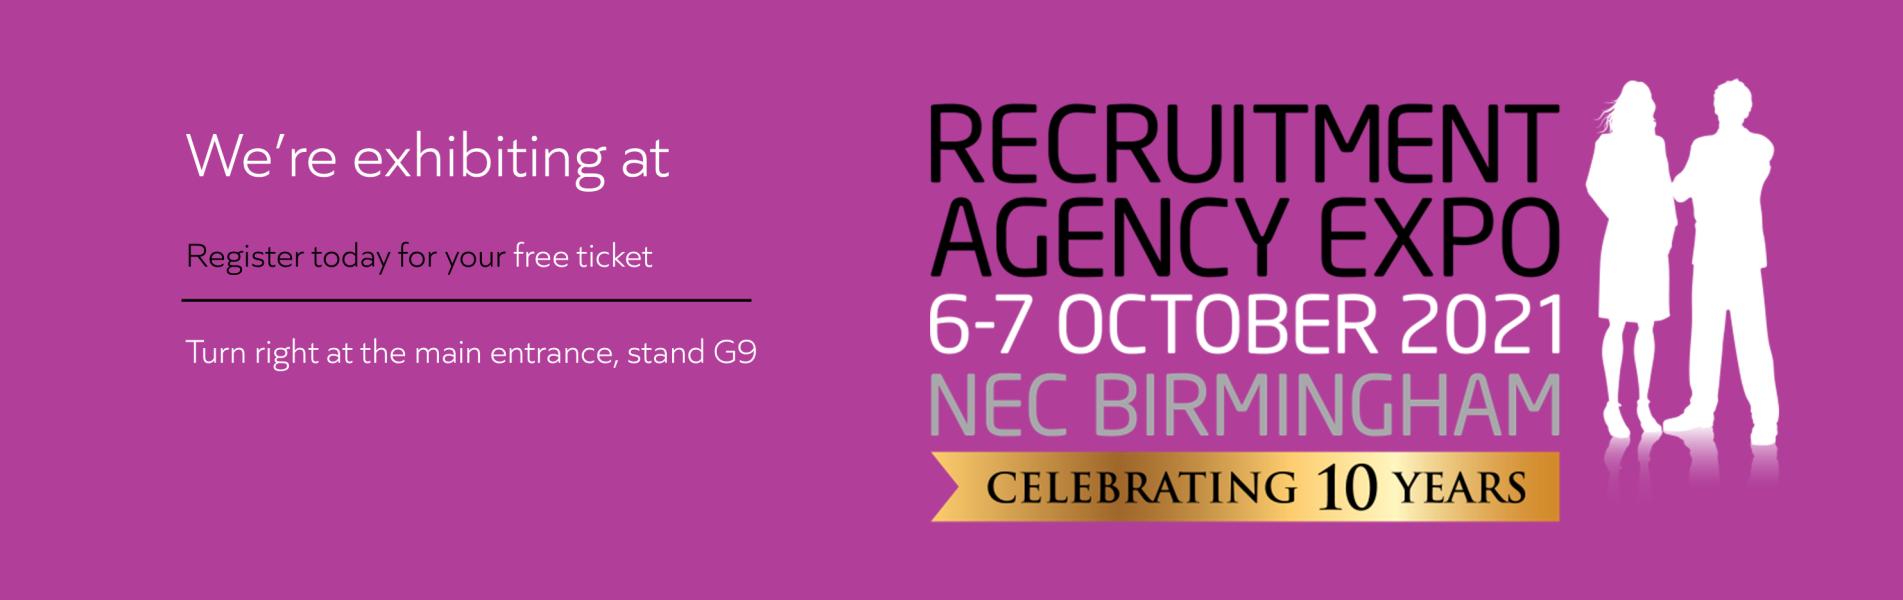 Recruitment Agency Expo | Recruitment CRM